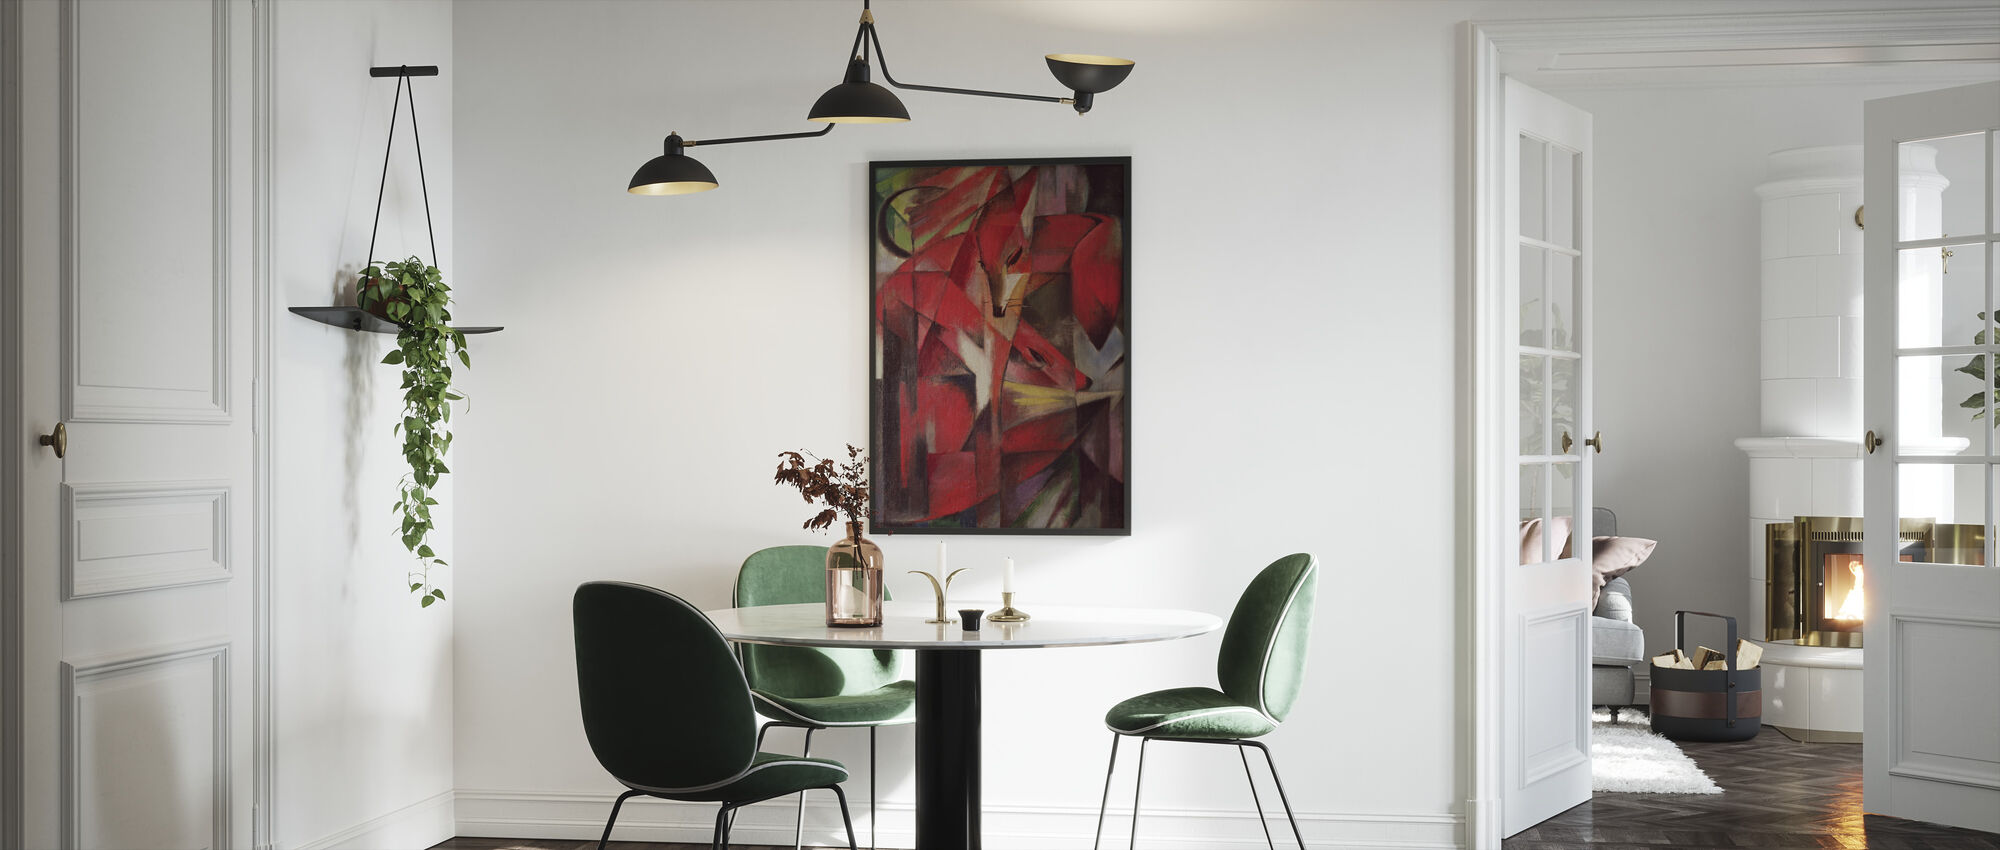 Foxes - Franz Marc - Framed print - Kitchen